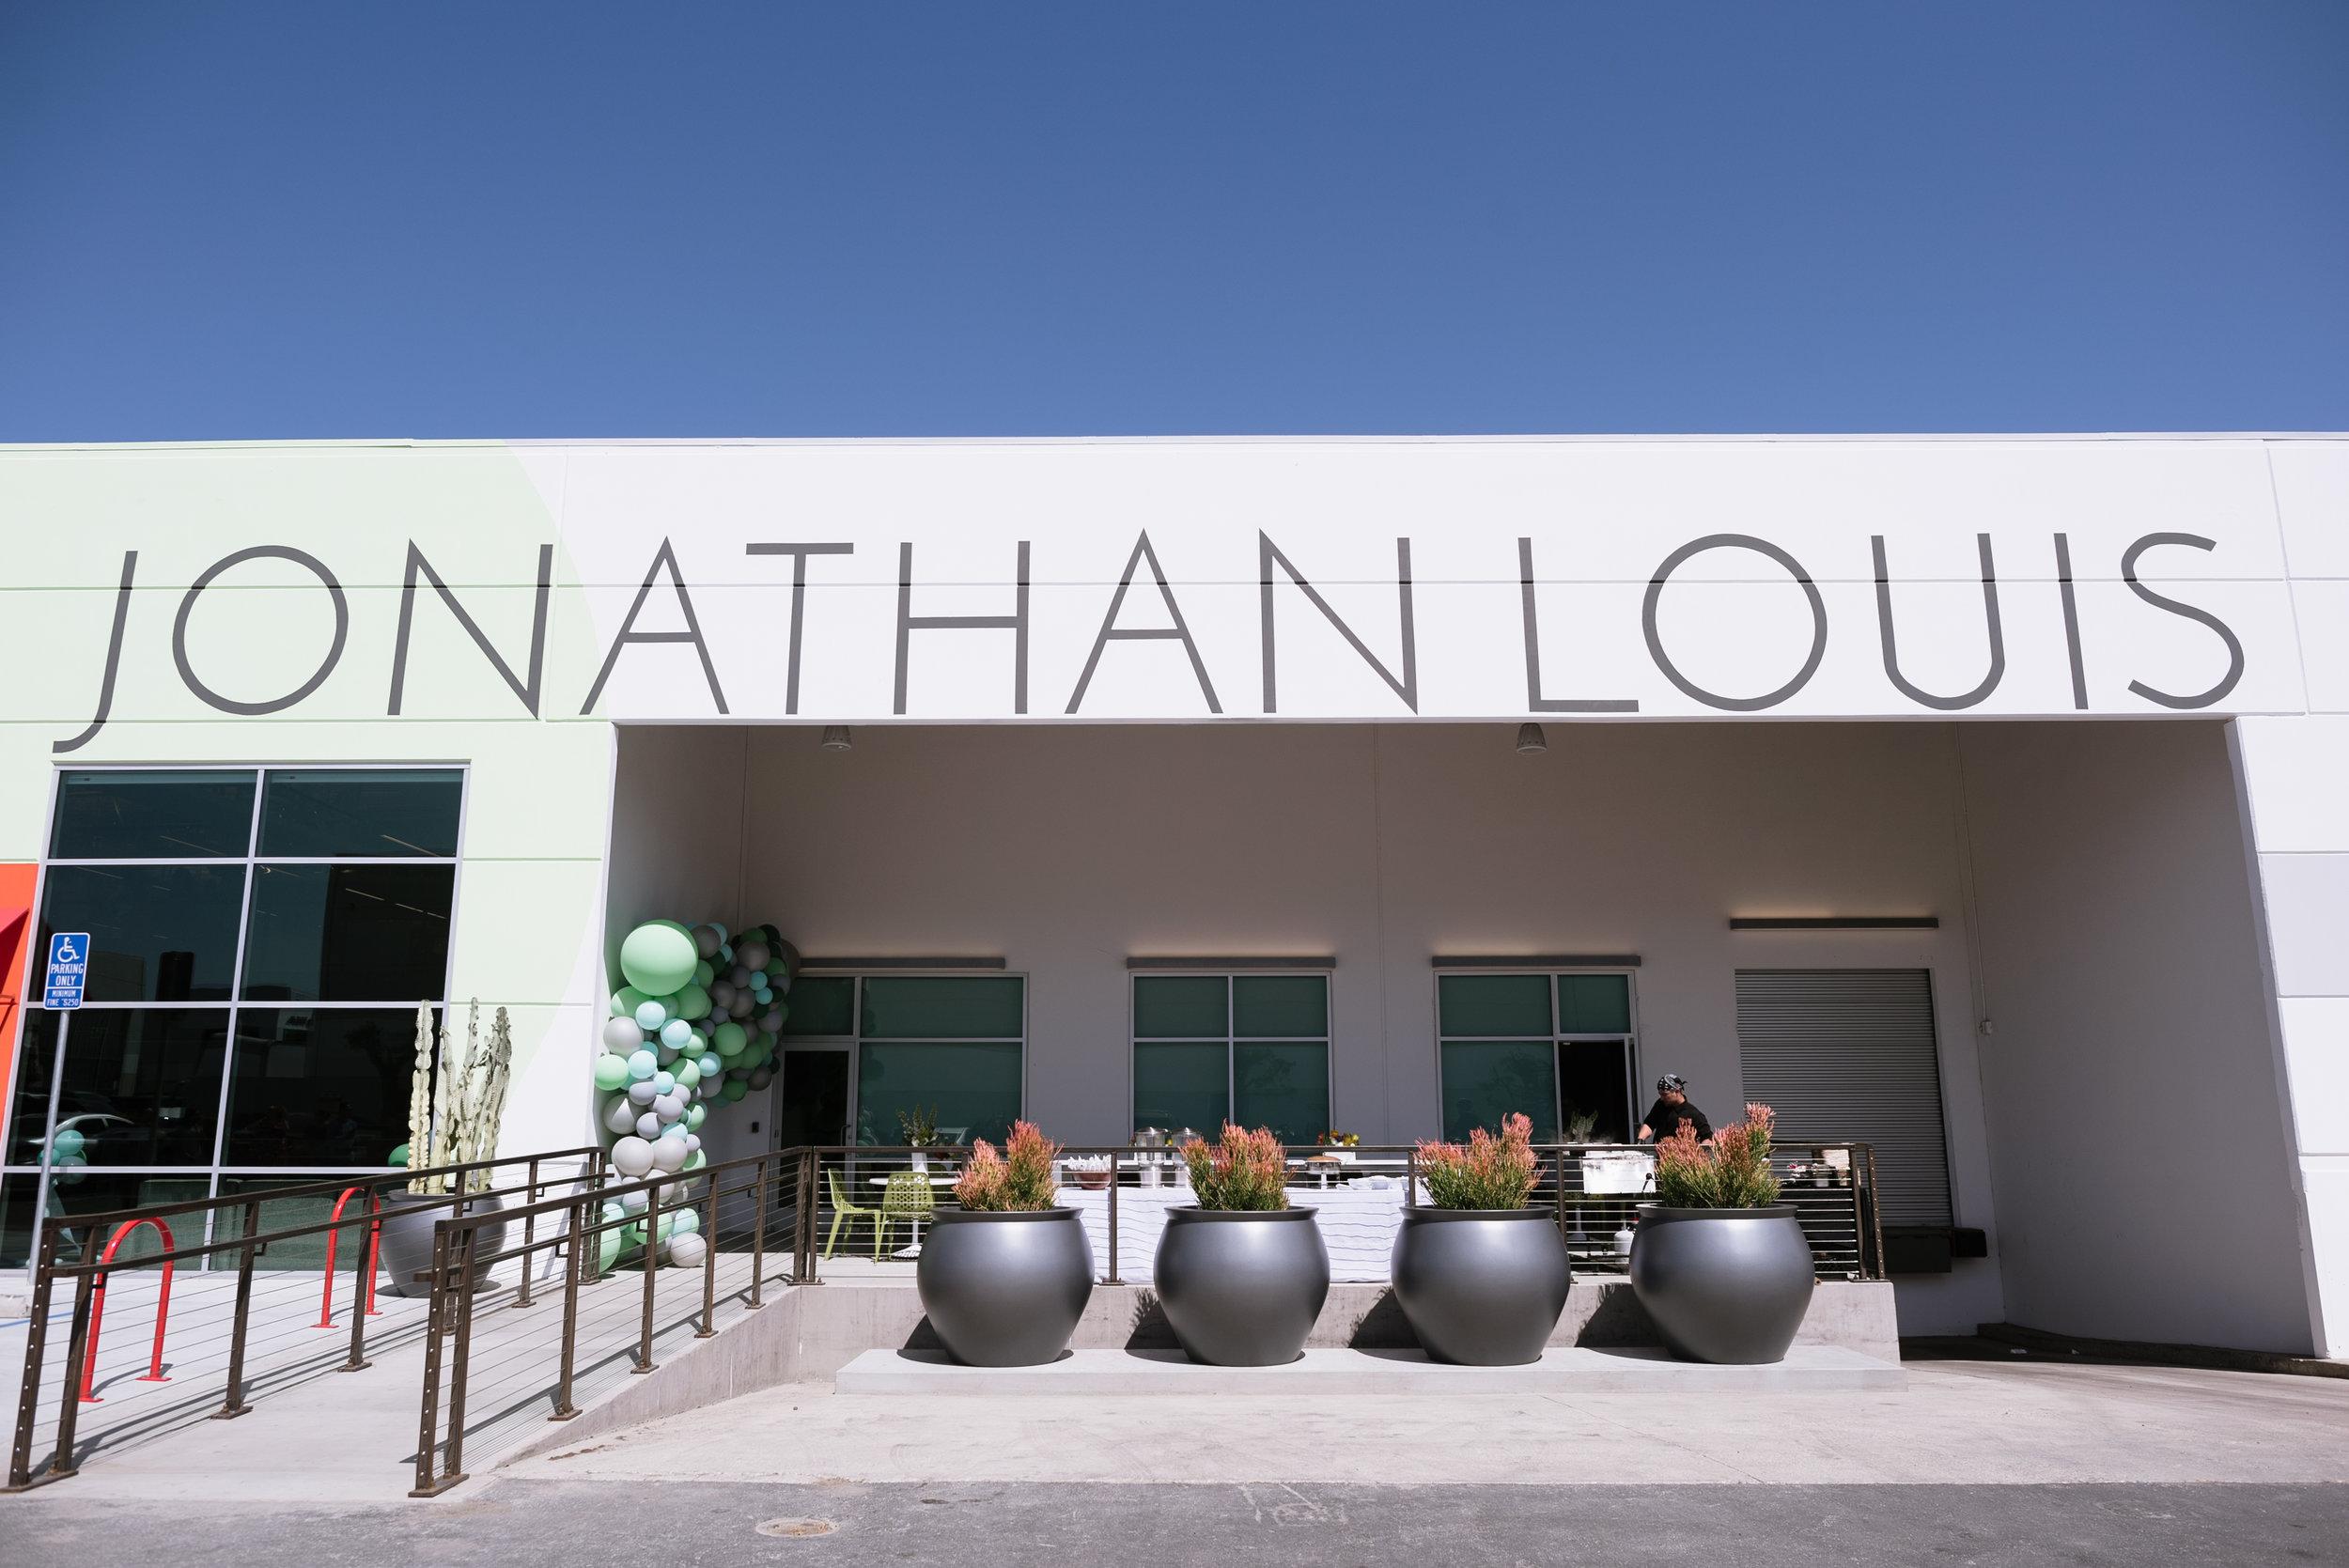 JonathanLouisOpening.jpg